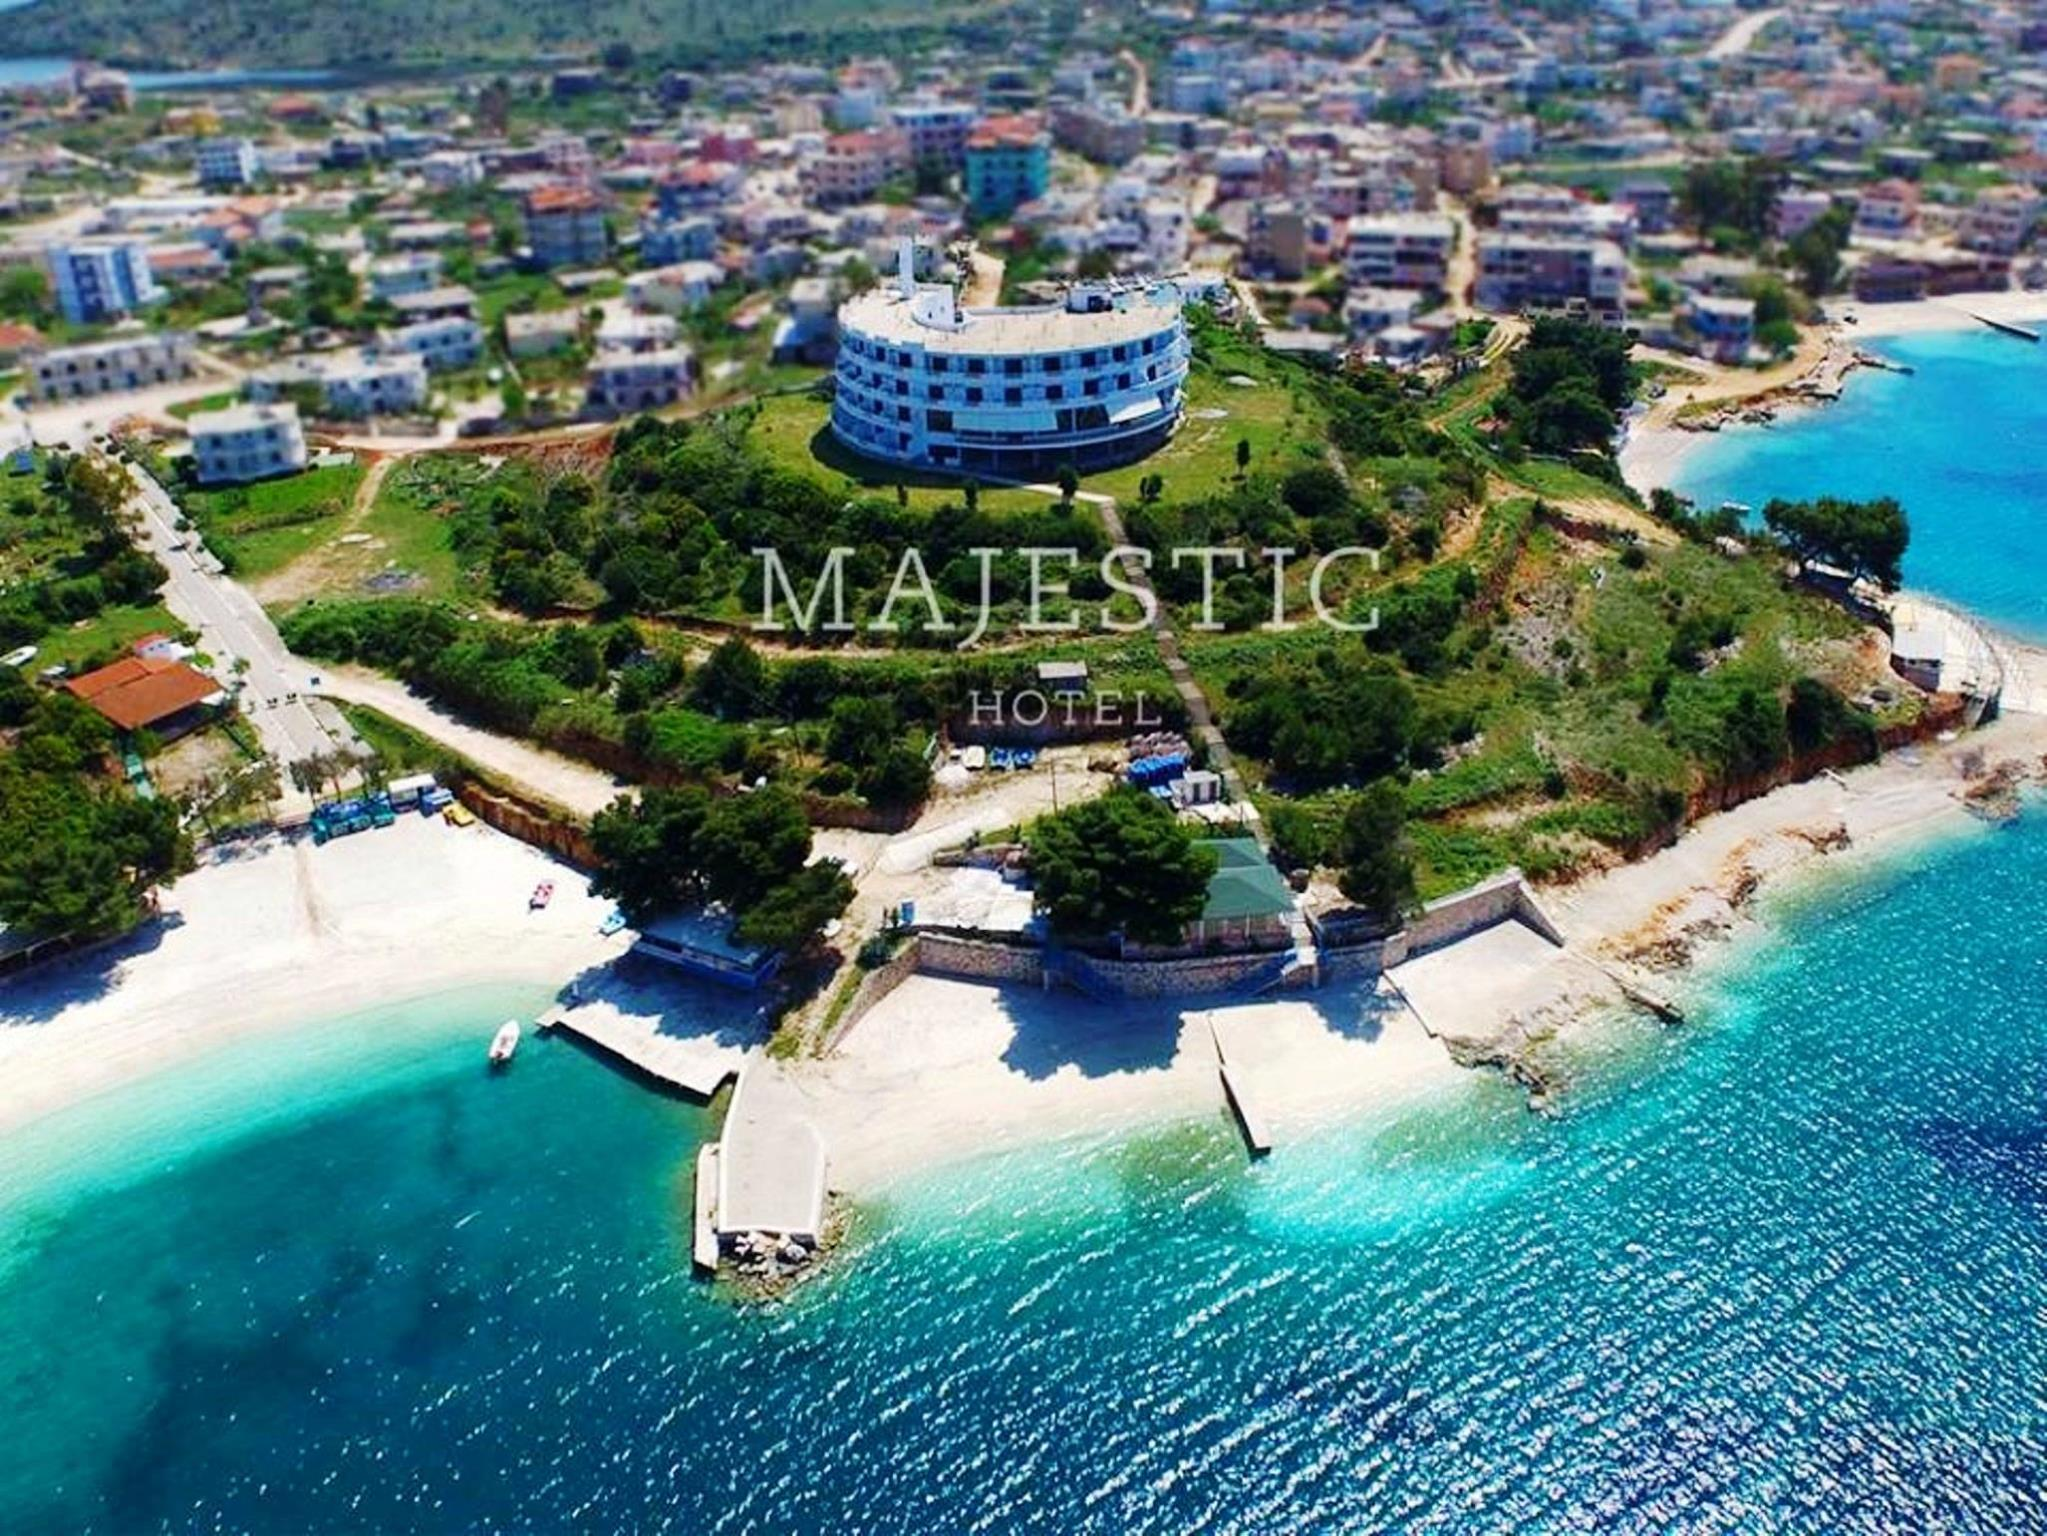 hotel majestic saranda albania great discounted rates 2111758 rh chiangdao com